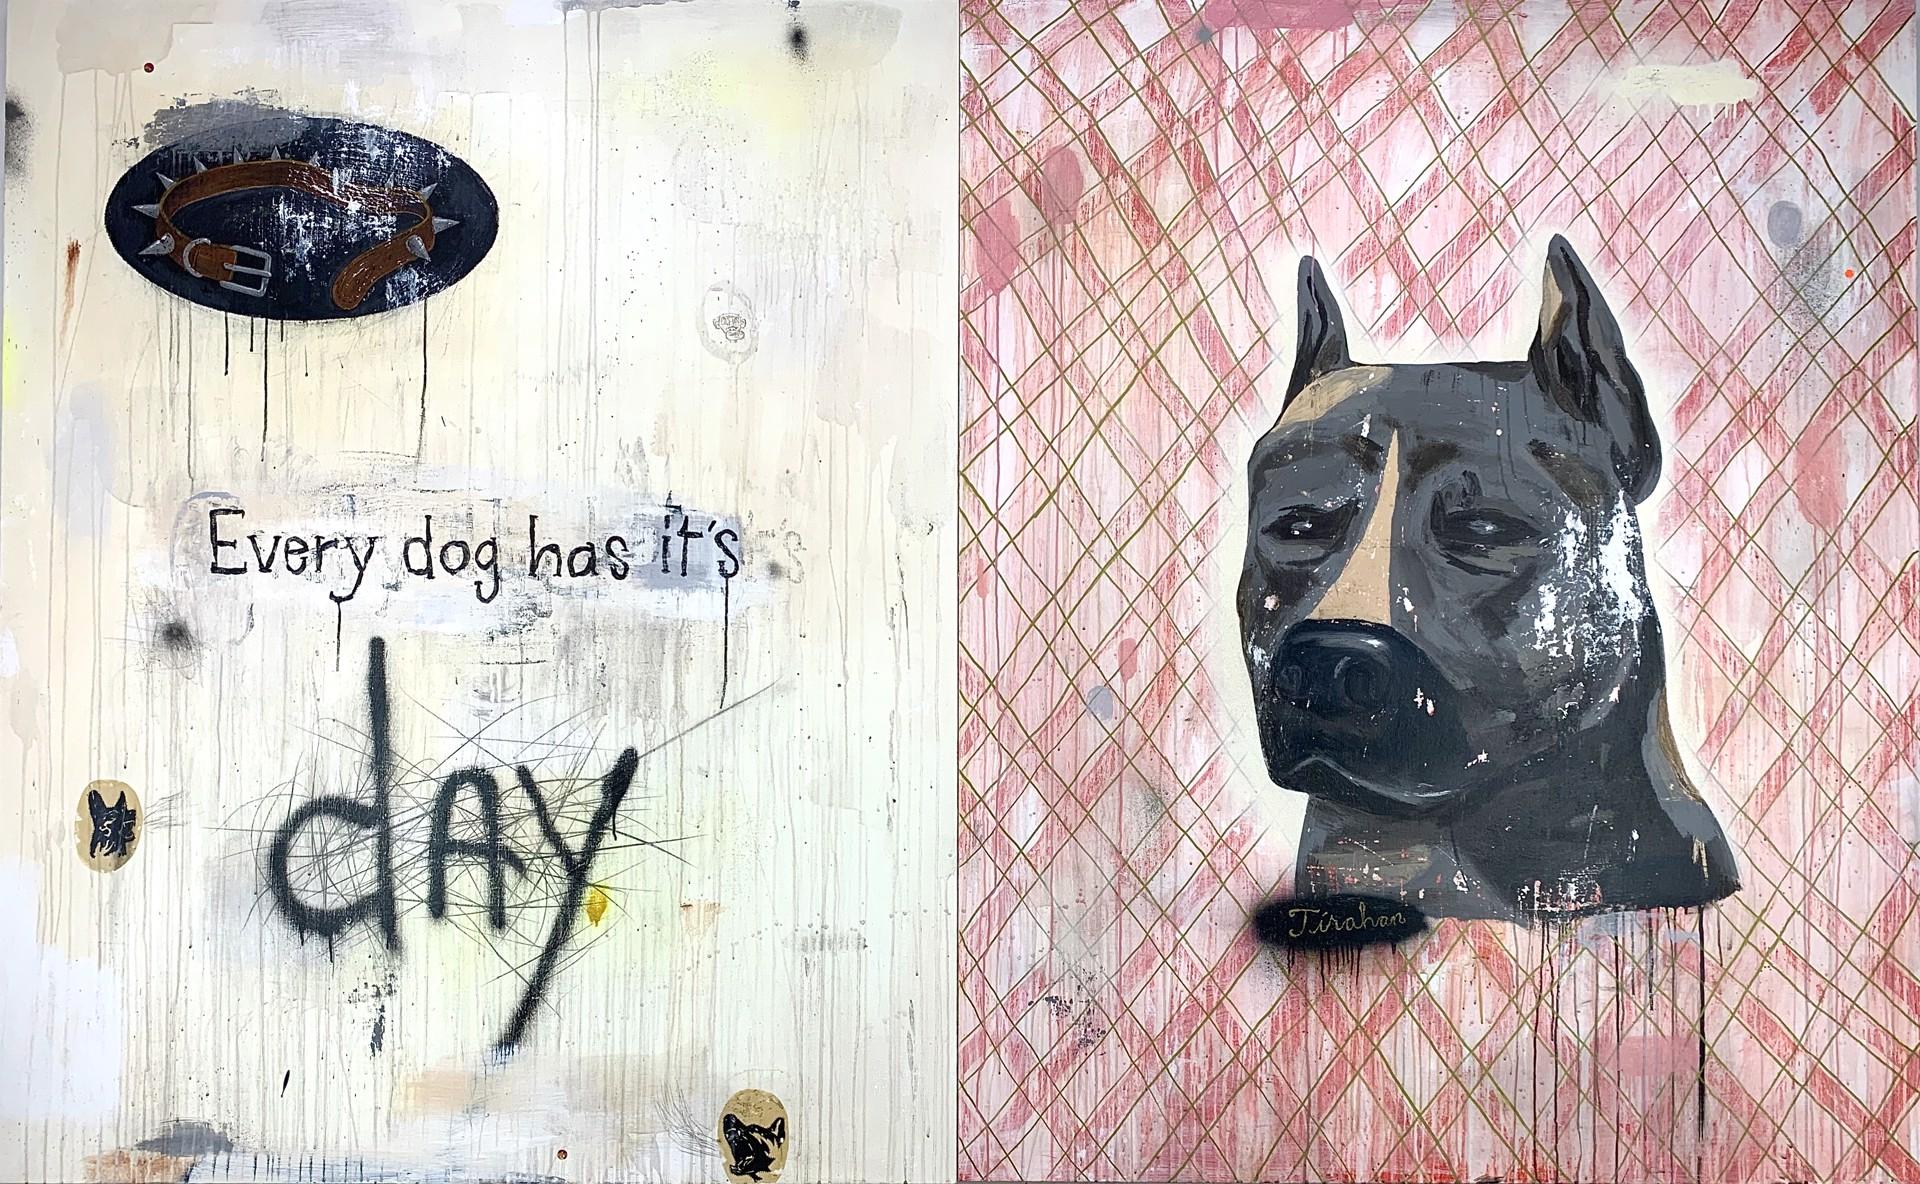 EVERY DOG HAS ITS DAY by John Yoyogi Fortes